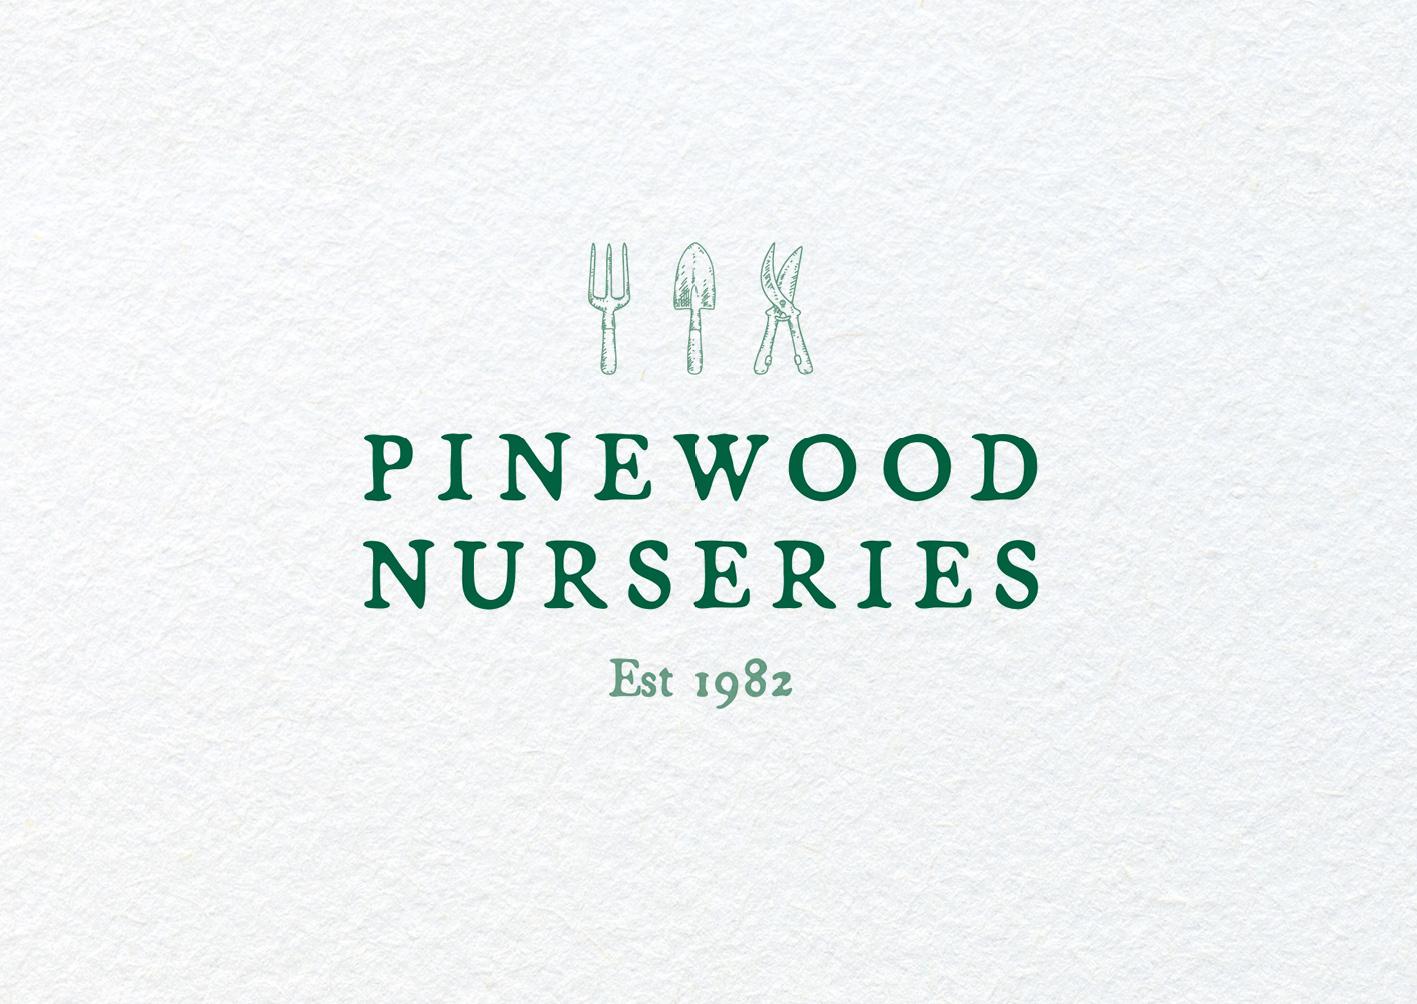 Pinewood Nurseries logo redesign